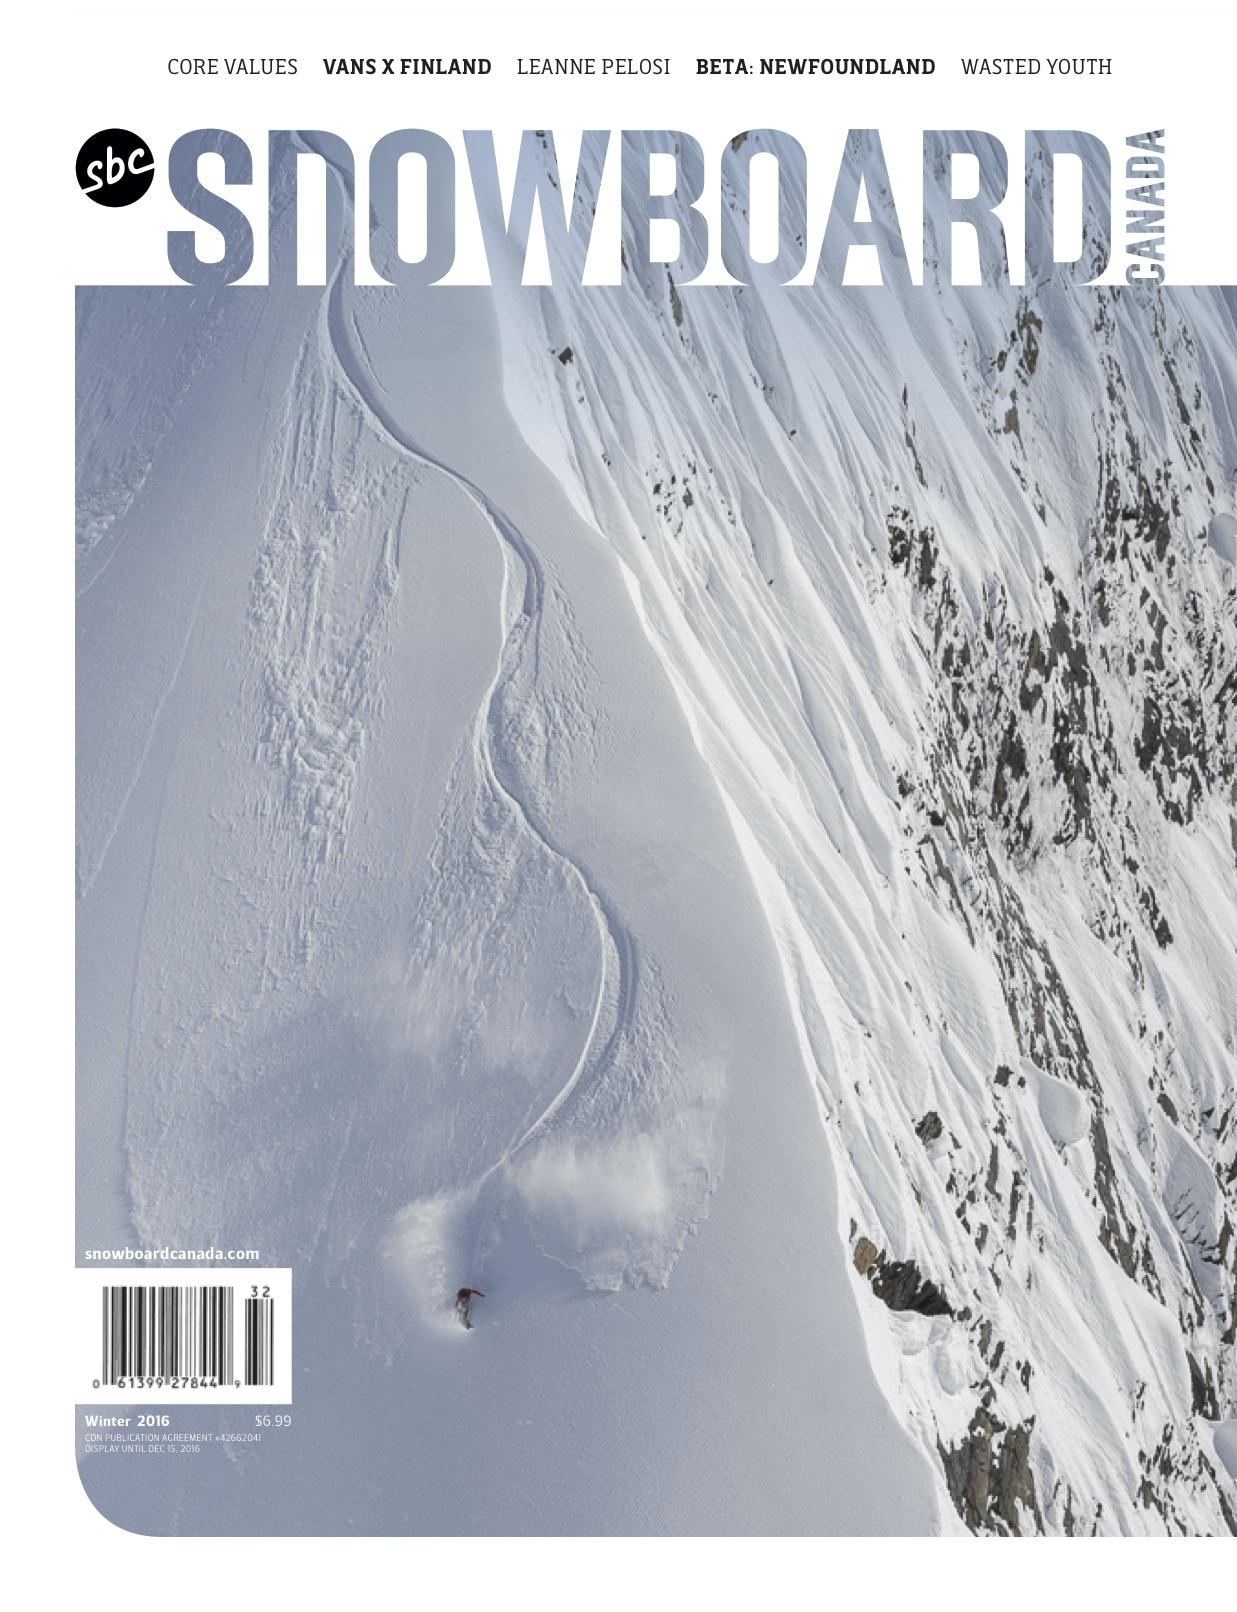 Snowboard2016_Cover.jpg